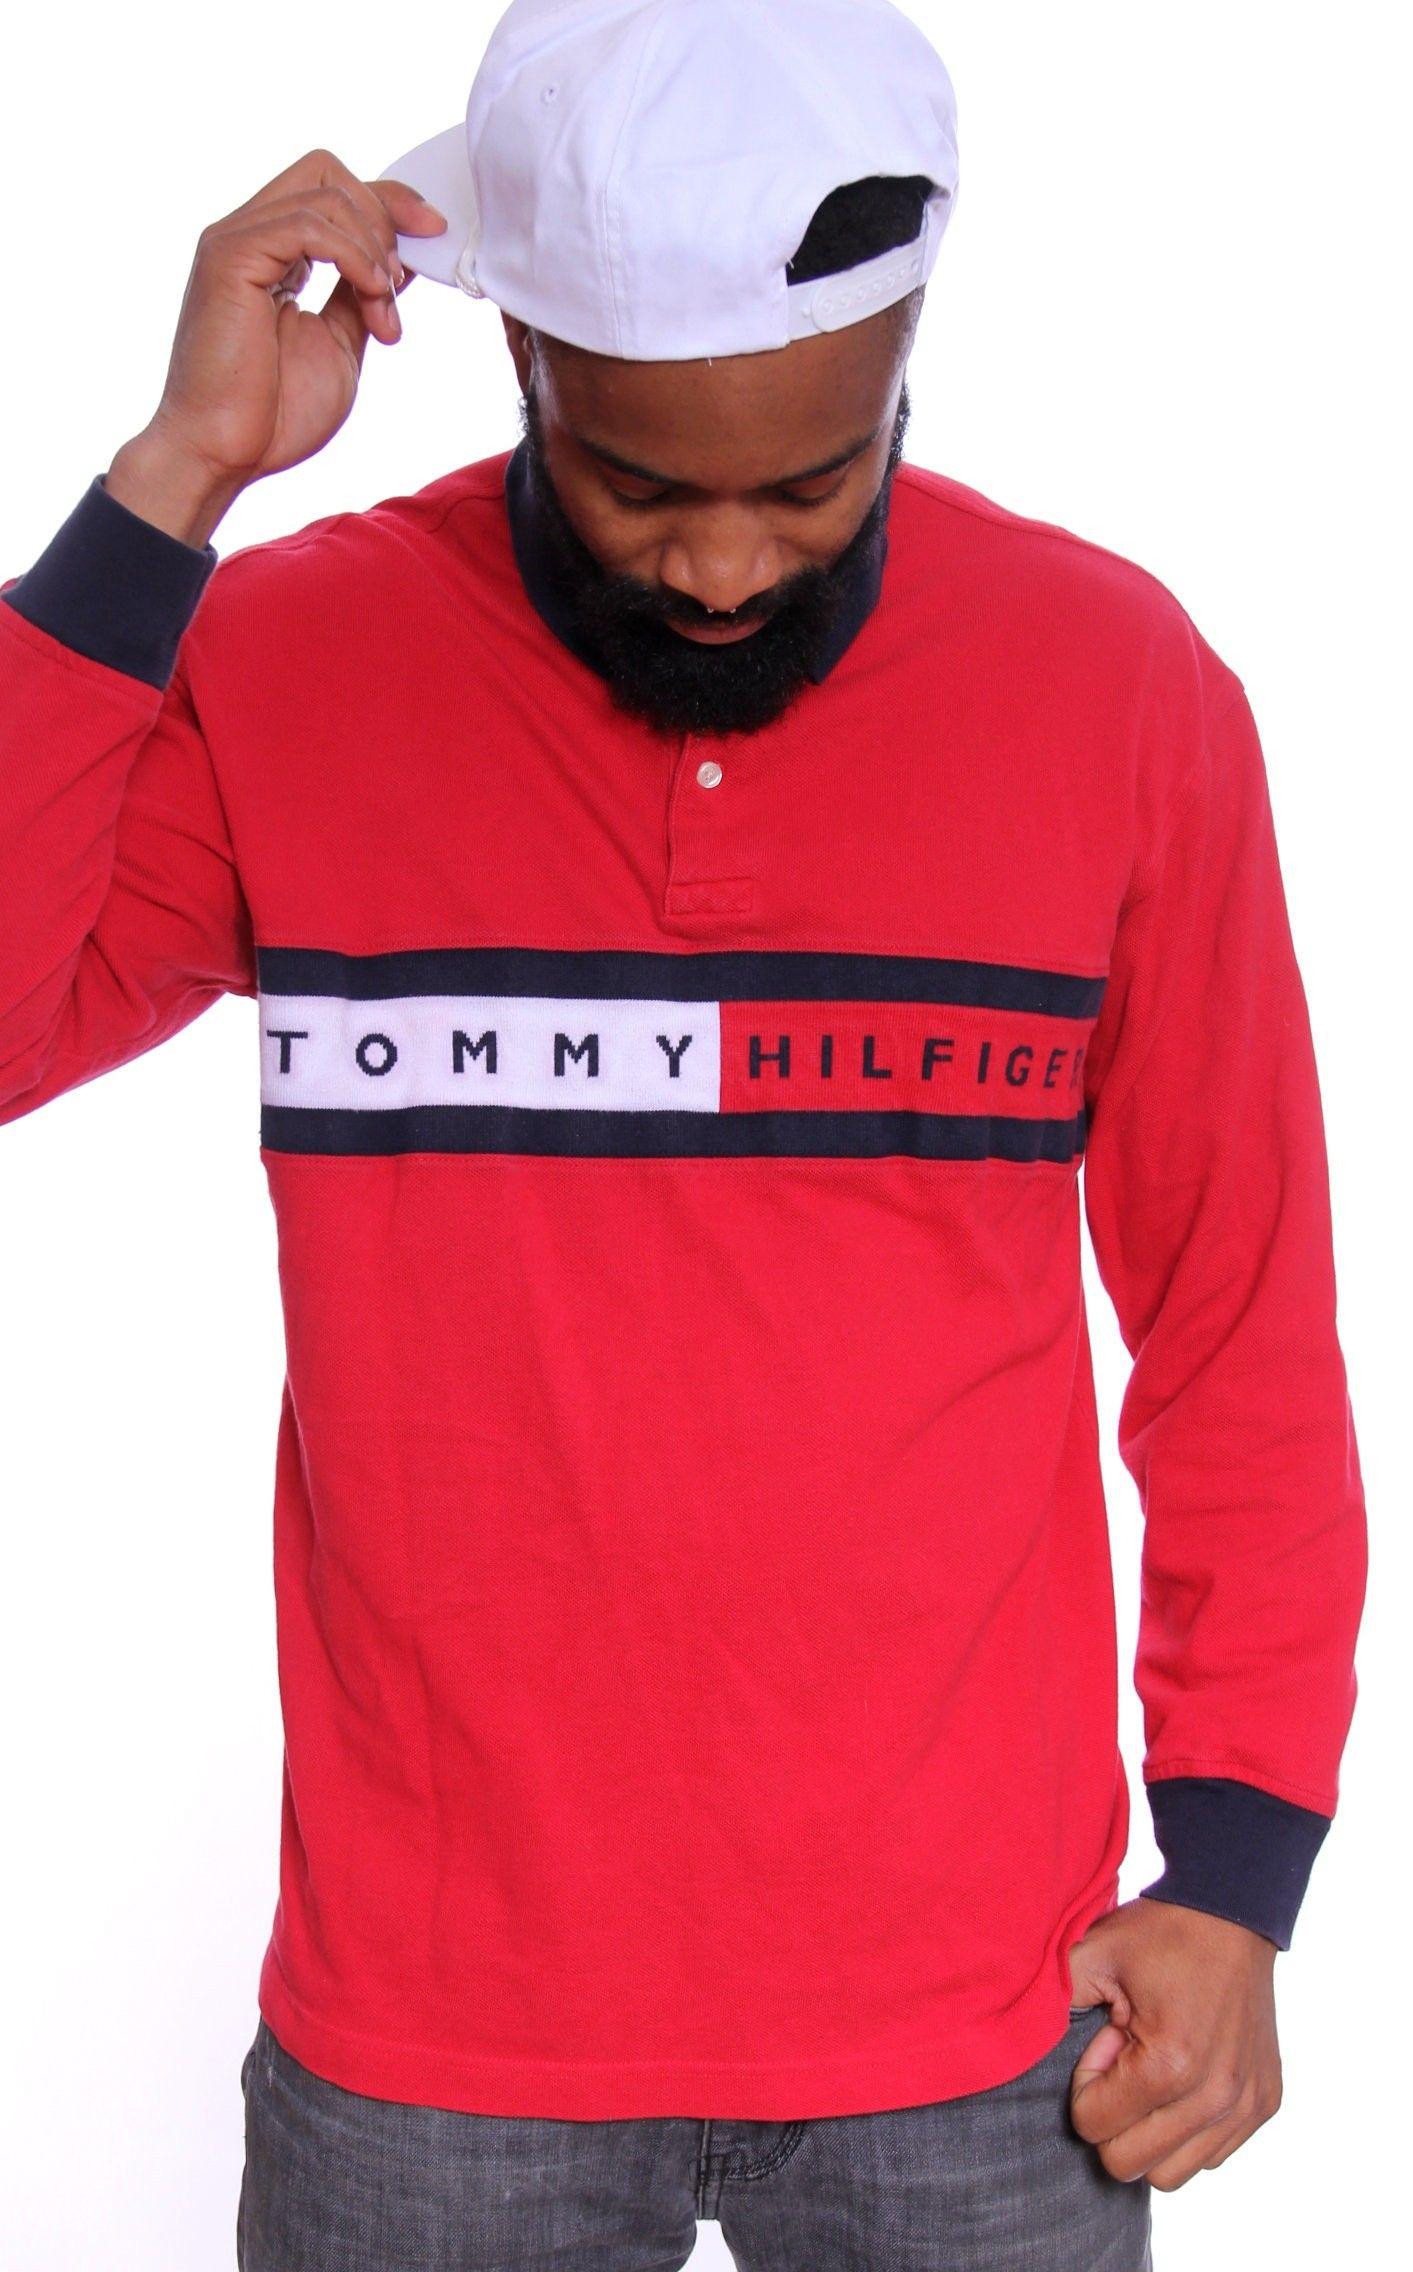 Vintage tommy hilfiger big crest spellout polo shirt for Tommy hilfiger vintage fit shirt